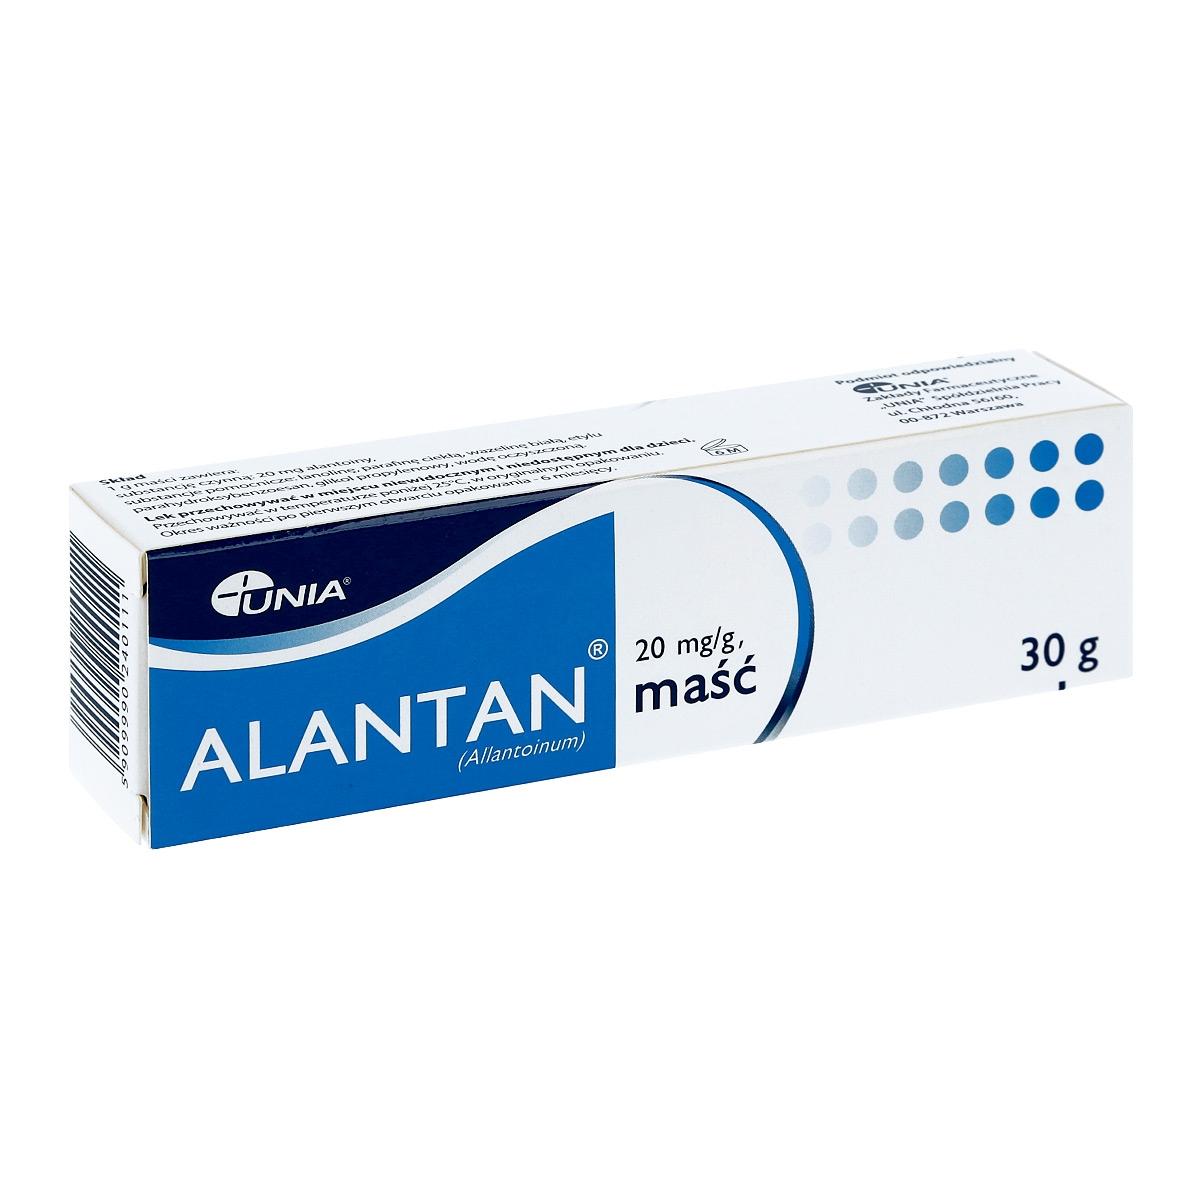 Image of Alantan maść (20mg/g)